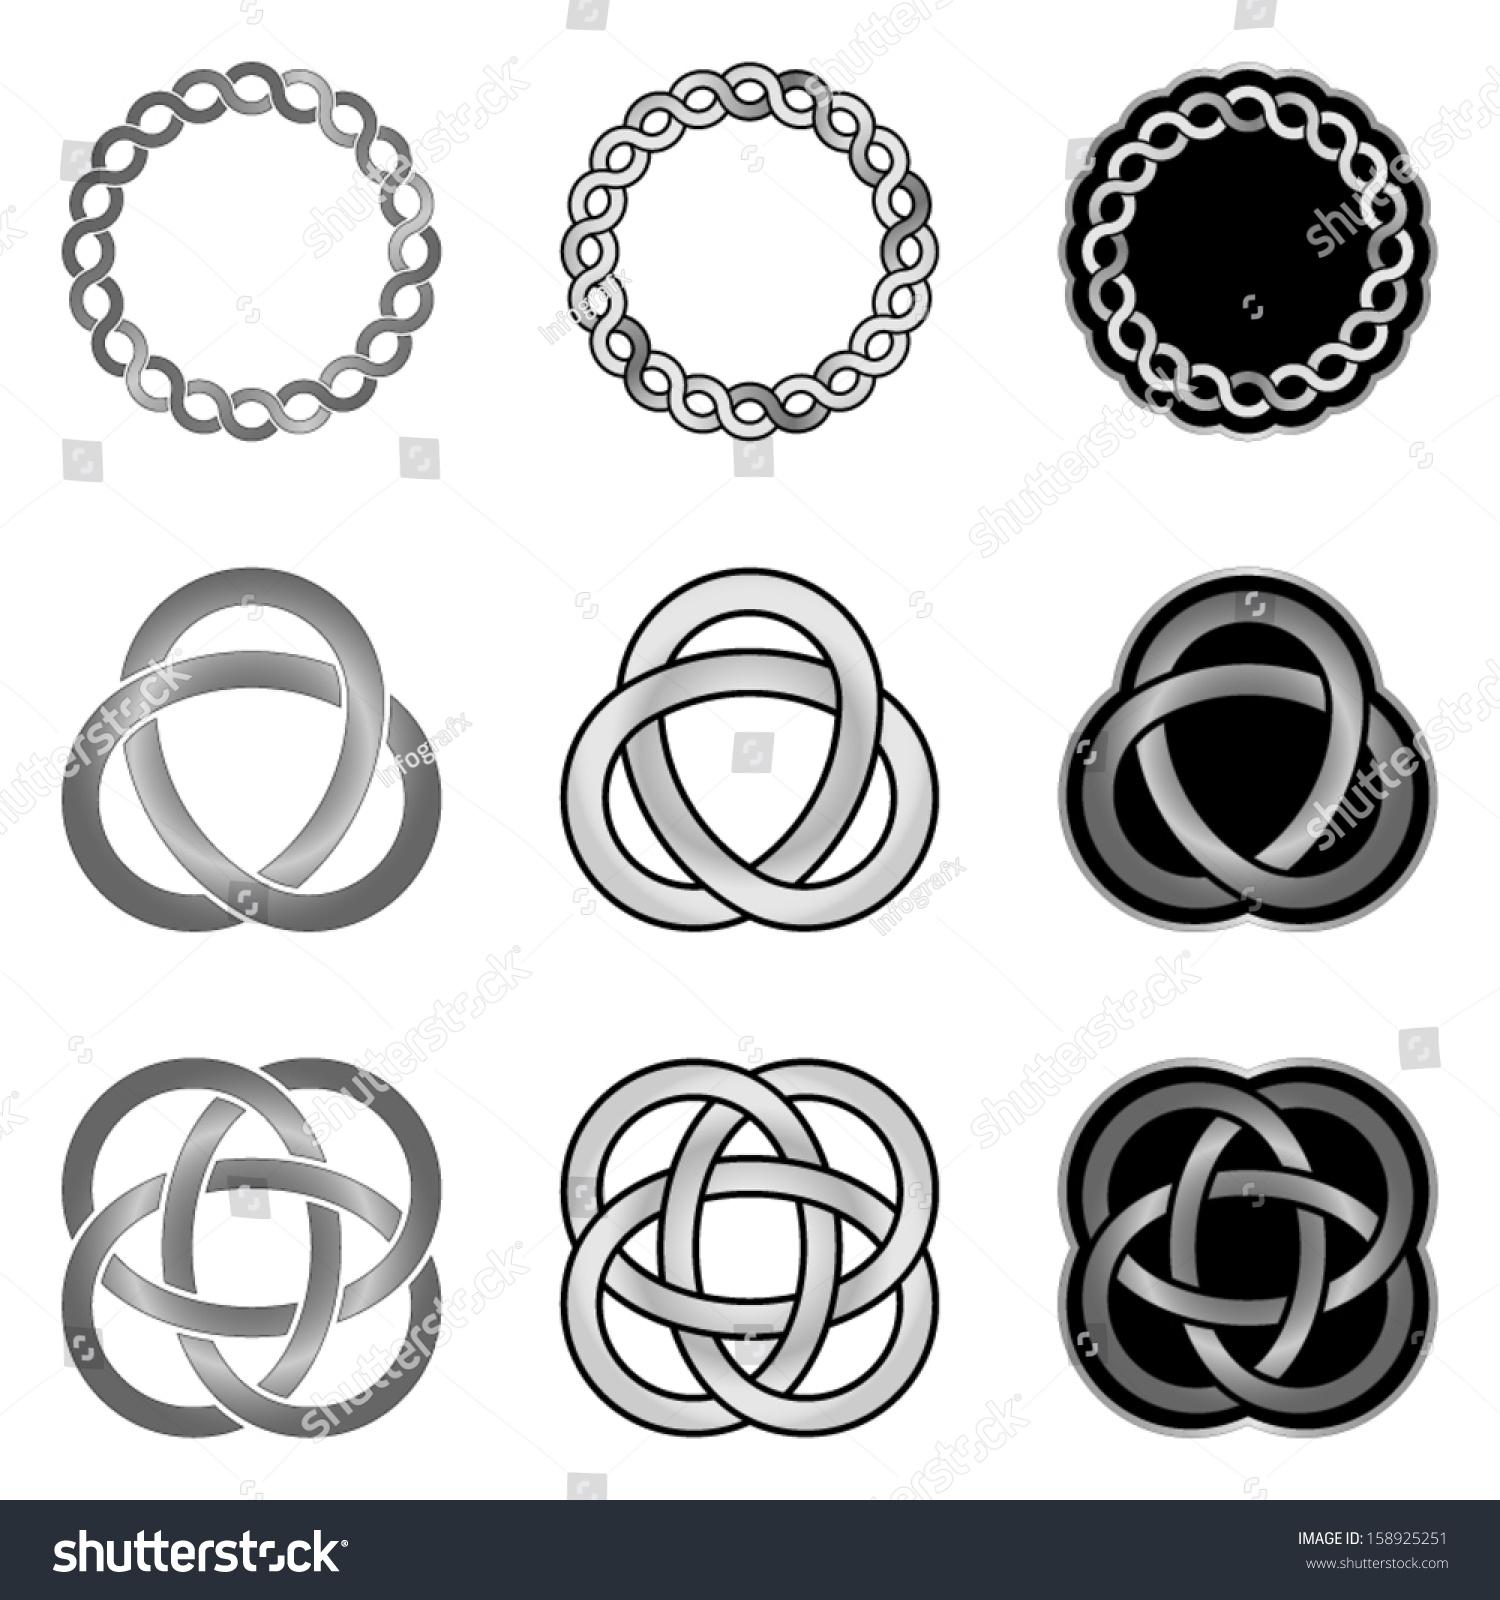 Celtic knot design elements patterns models templates stock vector celtic knot design elements patterns models and templates pronofoot35fo Image collections